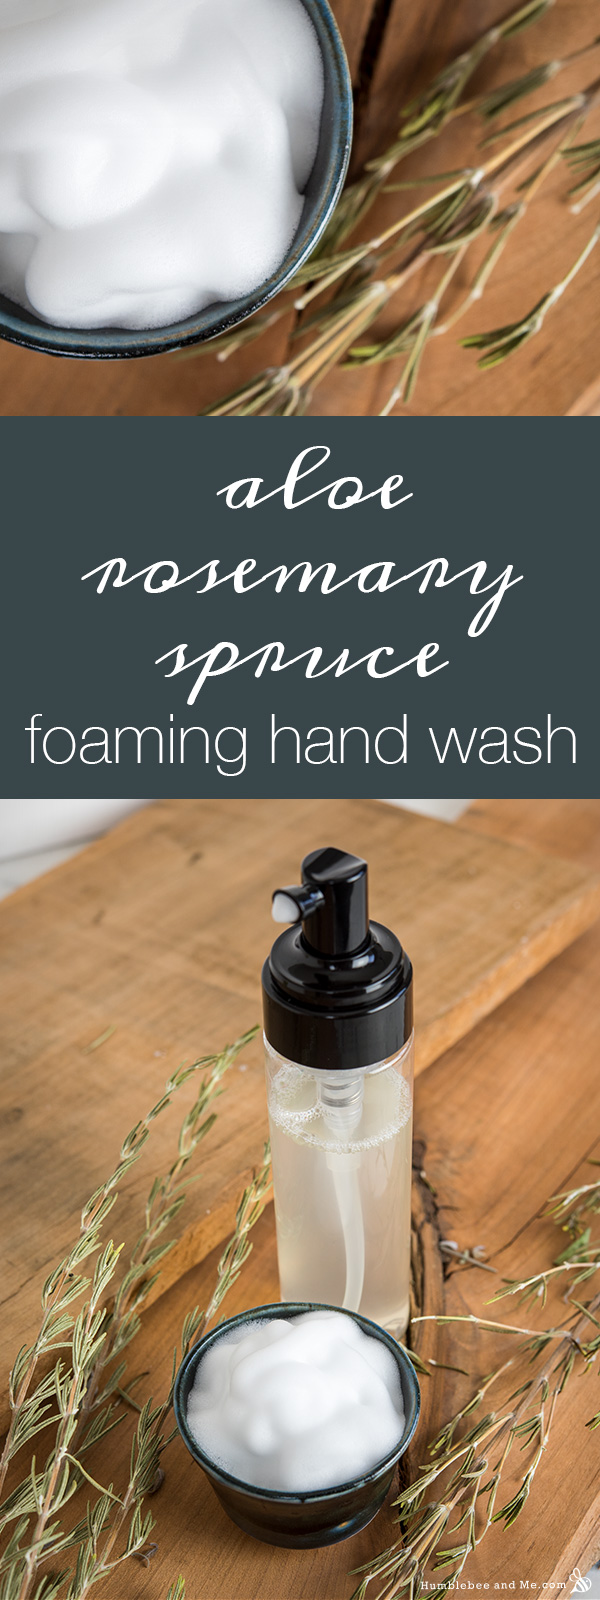 Aloe Rosemary Spruce Пенящееся средство для мытья рук